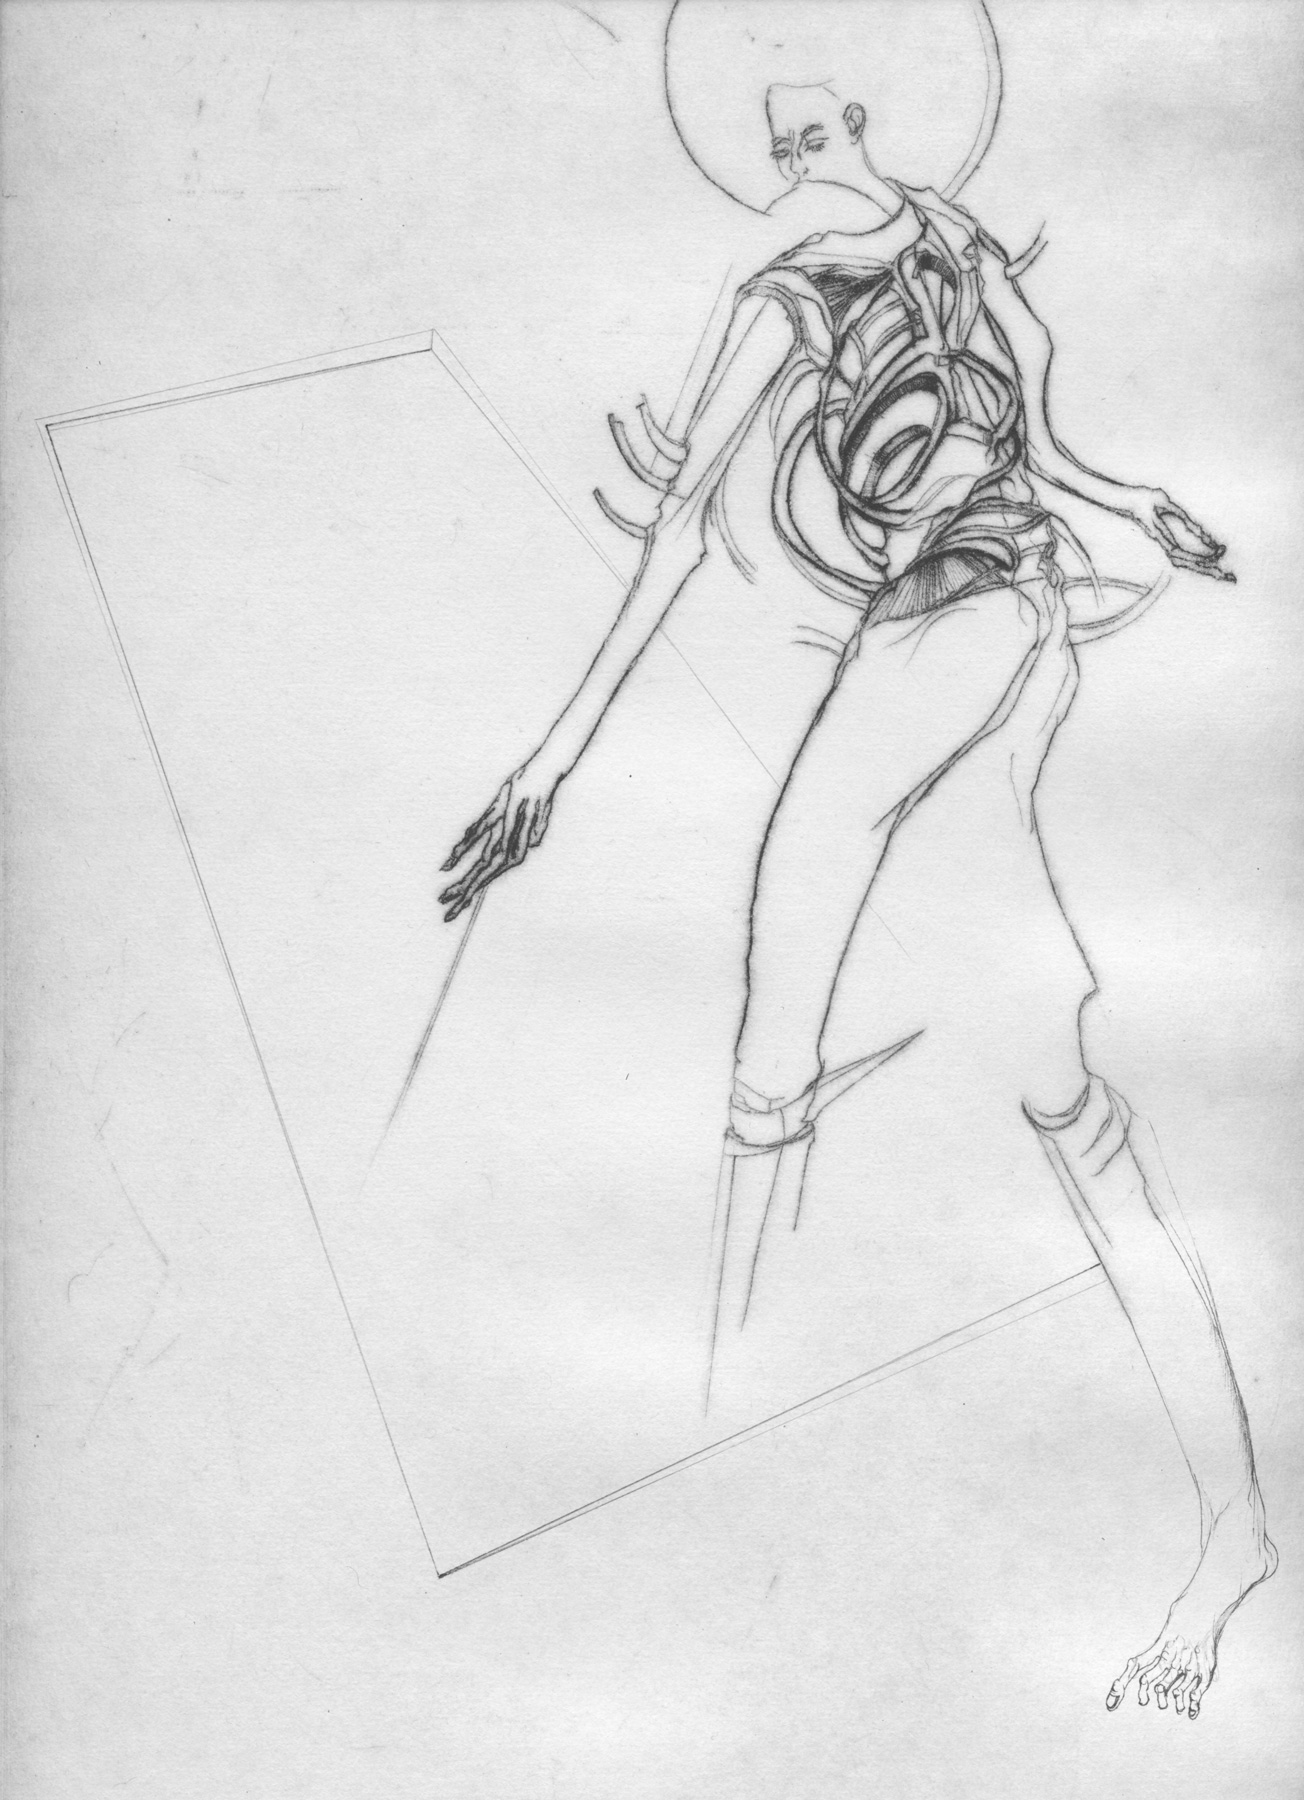 Nina Annabelle Märkl   One step inside 6 14   Kaltnadel, Tusche, Bleistift, 300g Hahnemühle Büttenpapier   Platte 35 x 23 cm Papier 56 x 39 cm